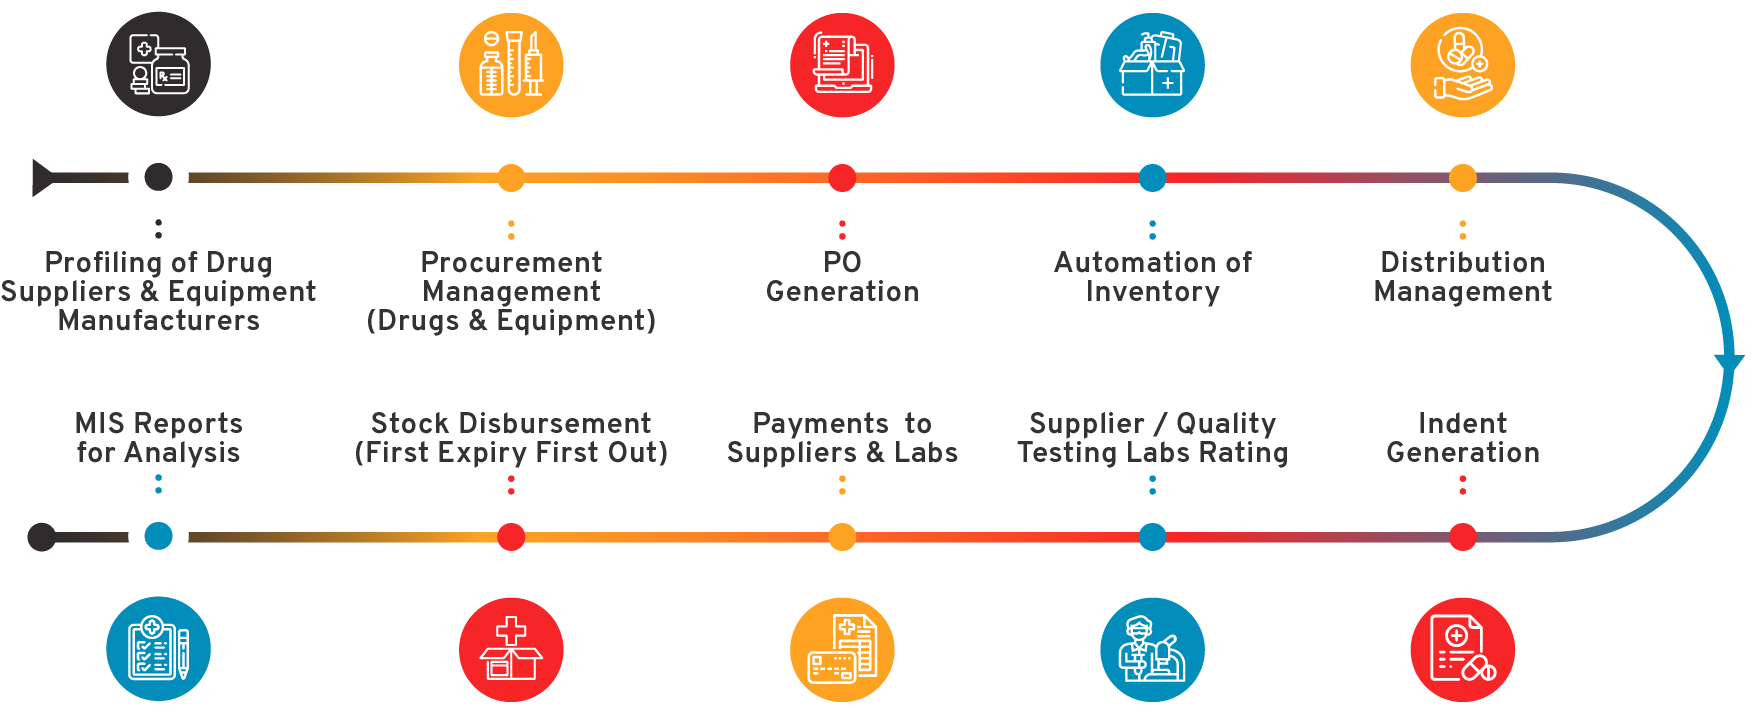 Drug Distribution & Supply Chain System Flow Diagram - CSM Technologies